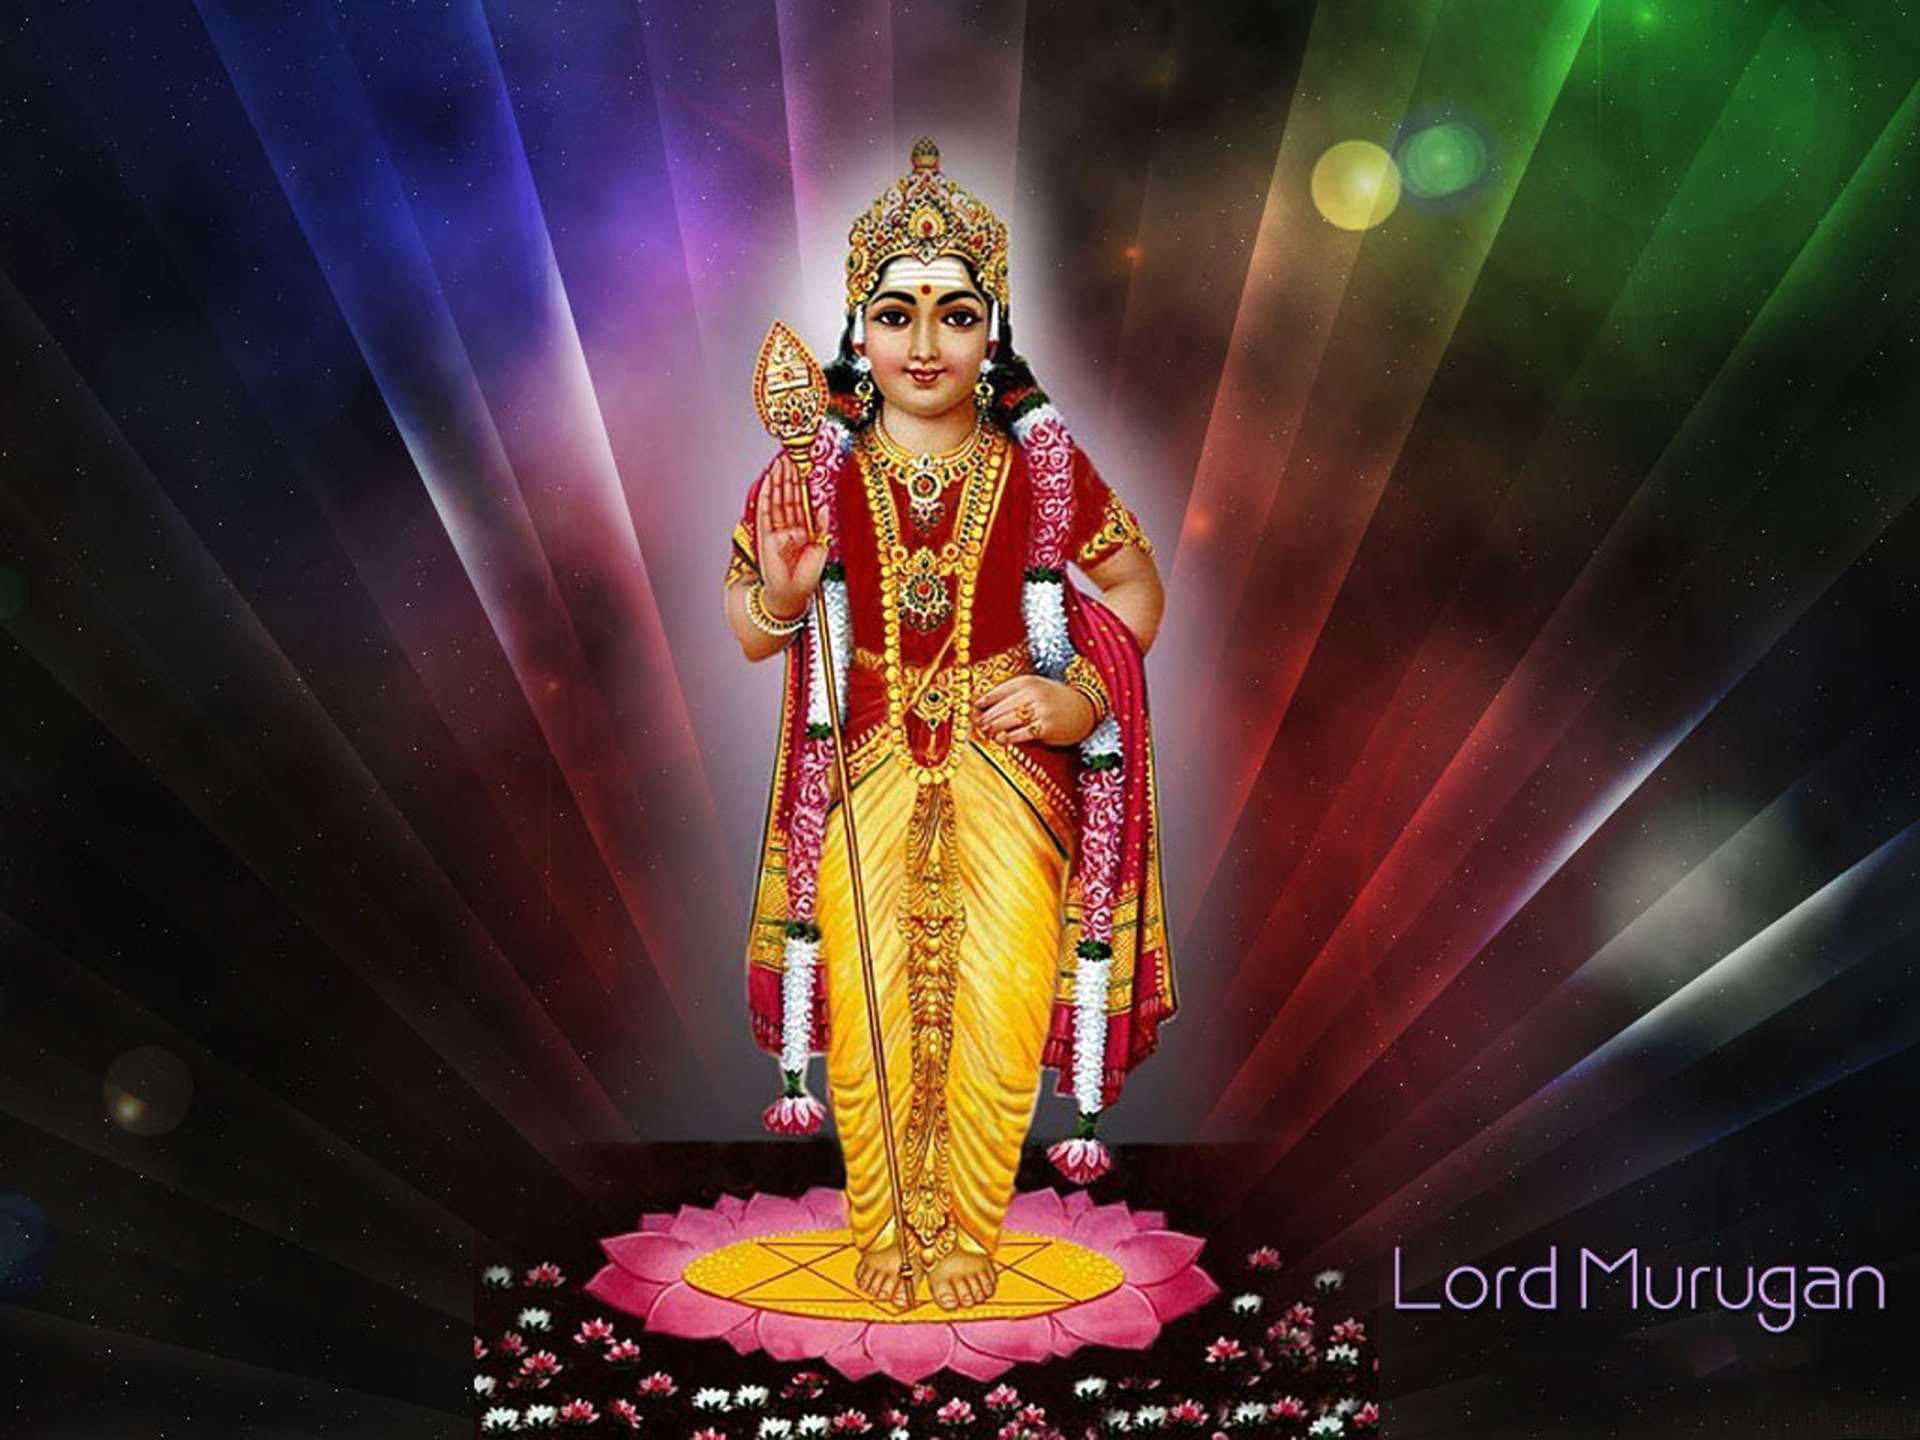 Lord Kartikeya HD Wallpaper 1080p Full Size Download | Lord